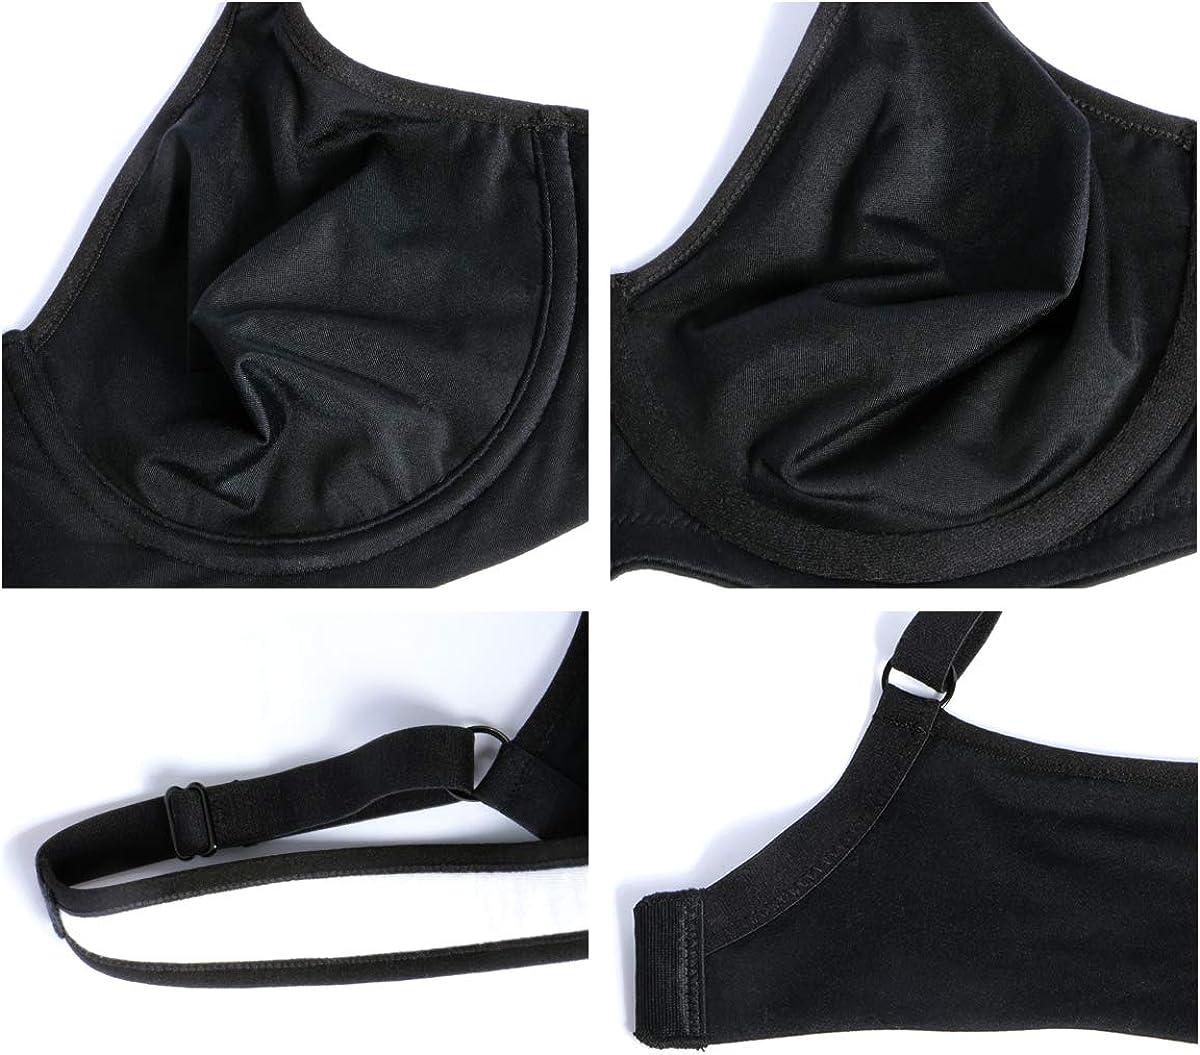 HSIA Womens Minimizer Underwire Unlind Bra Full Coverage Non Padded T-Shirt Molded Full Bust Bra 34C-42DDD